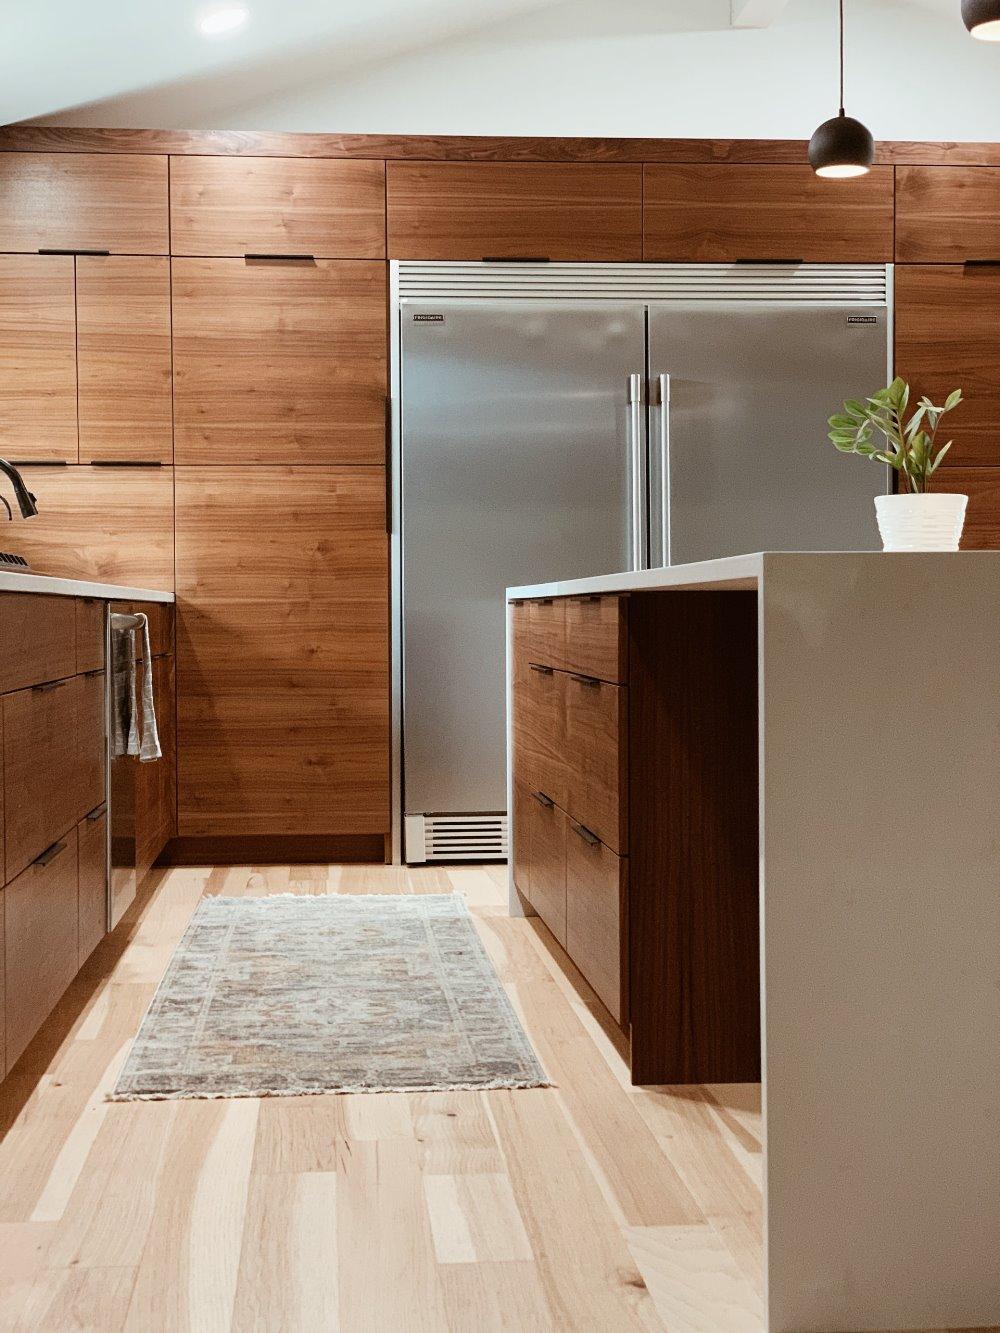 رنگ فرش آشپزخانه مدرن